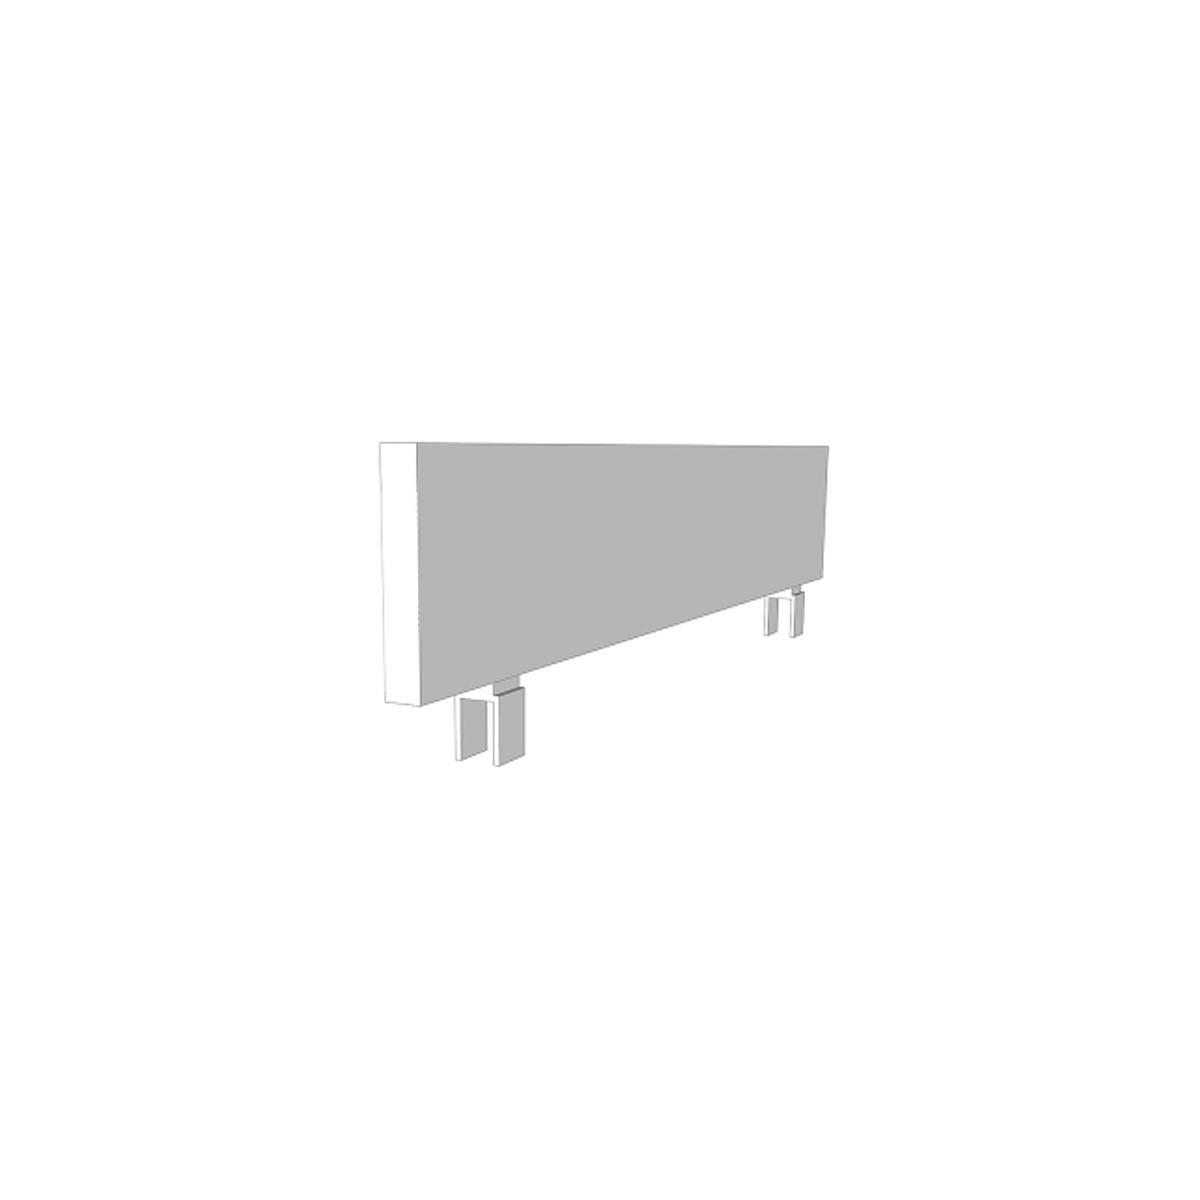 Full Size of Kinderbett Mit Schutzgitter Holz Baby Bettschutzgitter Ikea Bett Boxspringbett Selber Bauen Hemnes Vikare Lidl Malm One Erwachsene Kinder Ebay Kleinanzeigen Bett Schutzgitter Bett